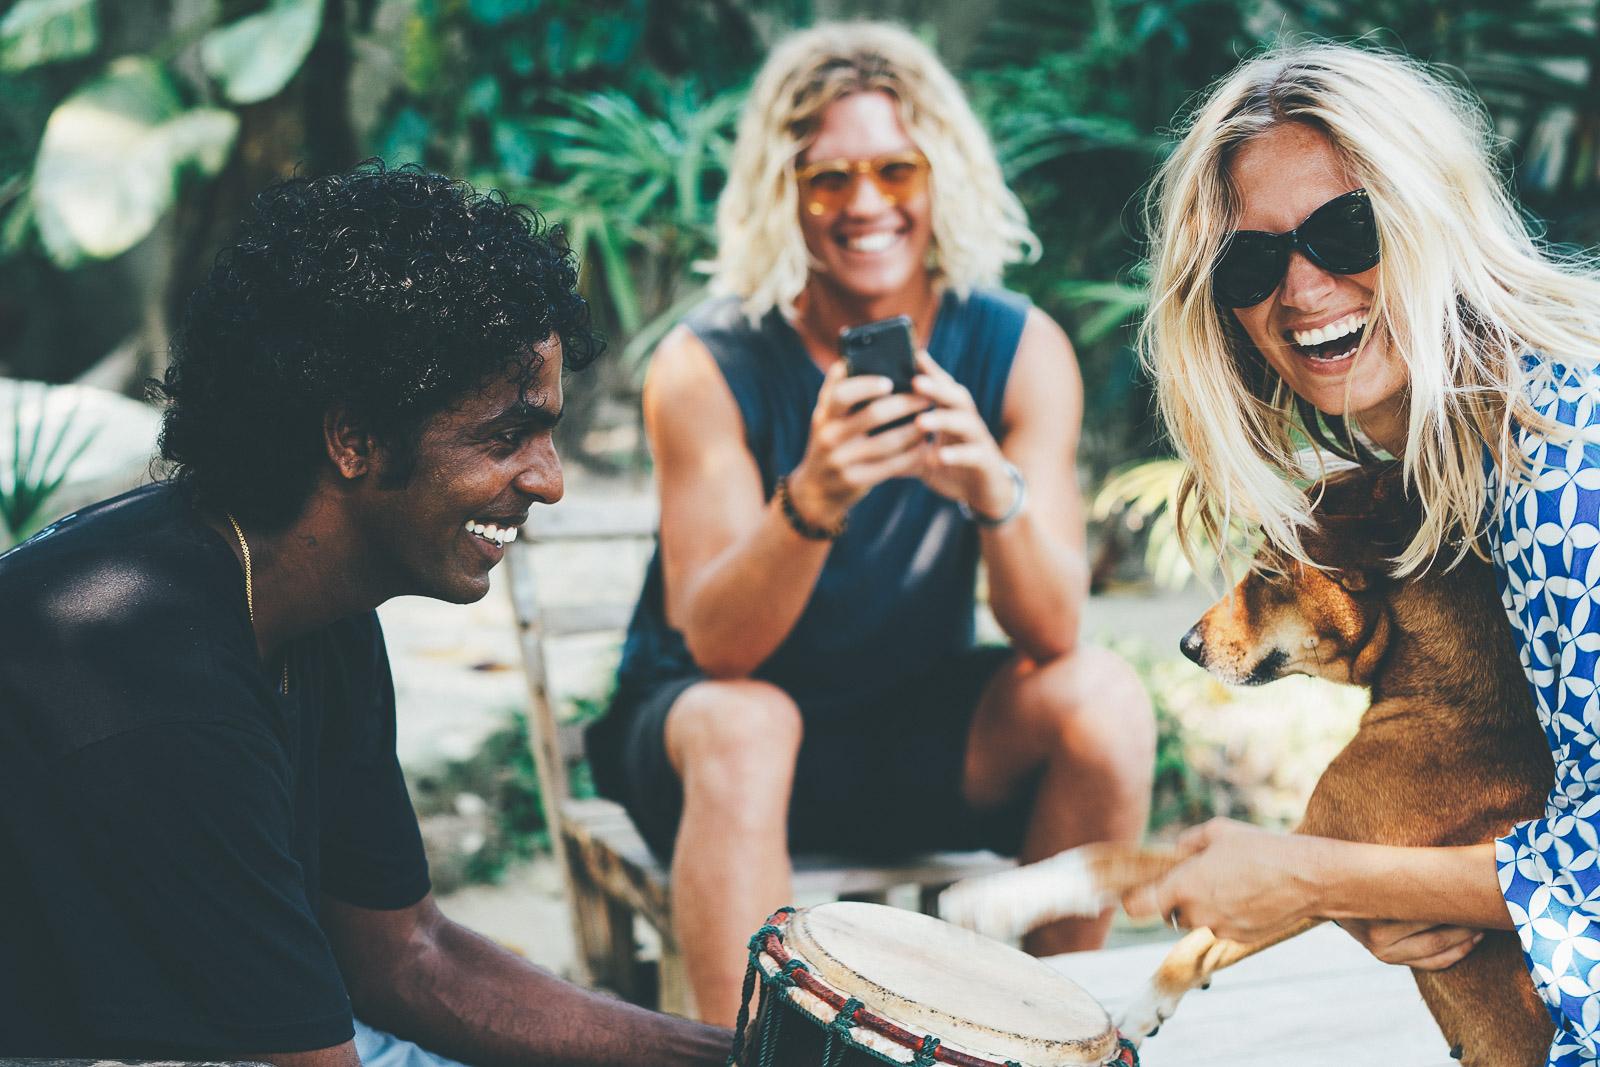 Sunshinestories-surf-travel-blog-DSC05424